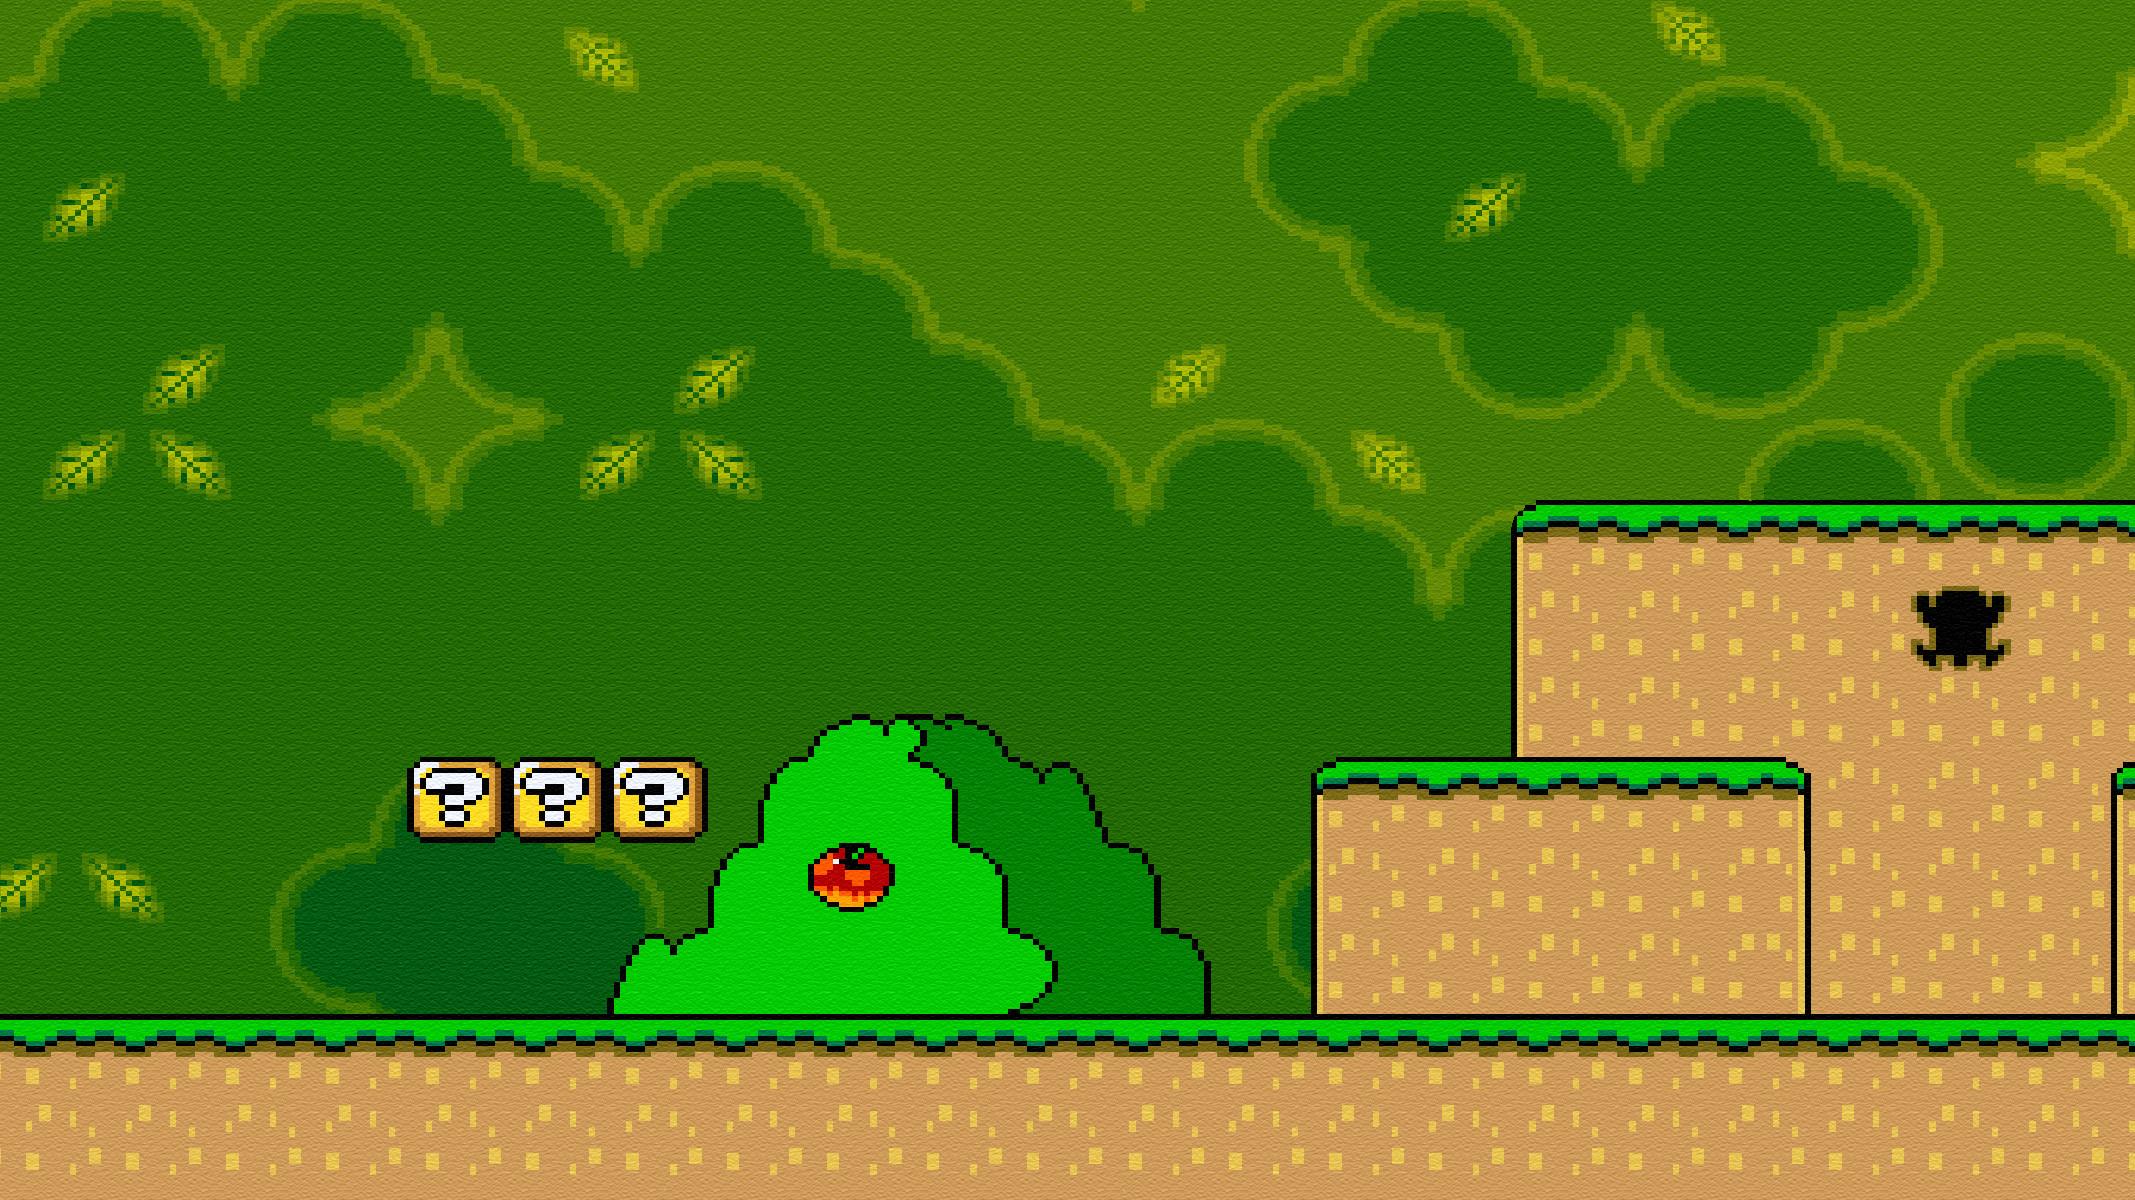 Super Mario World Wallpapers HD Resolution